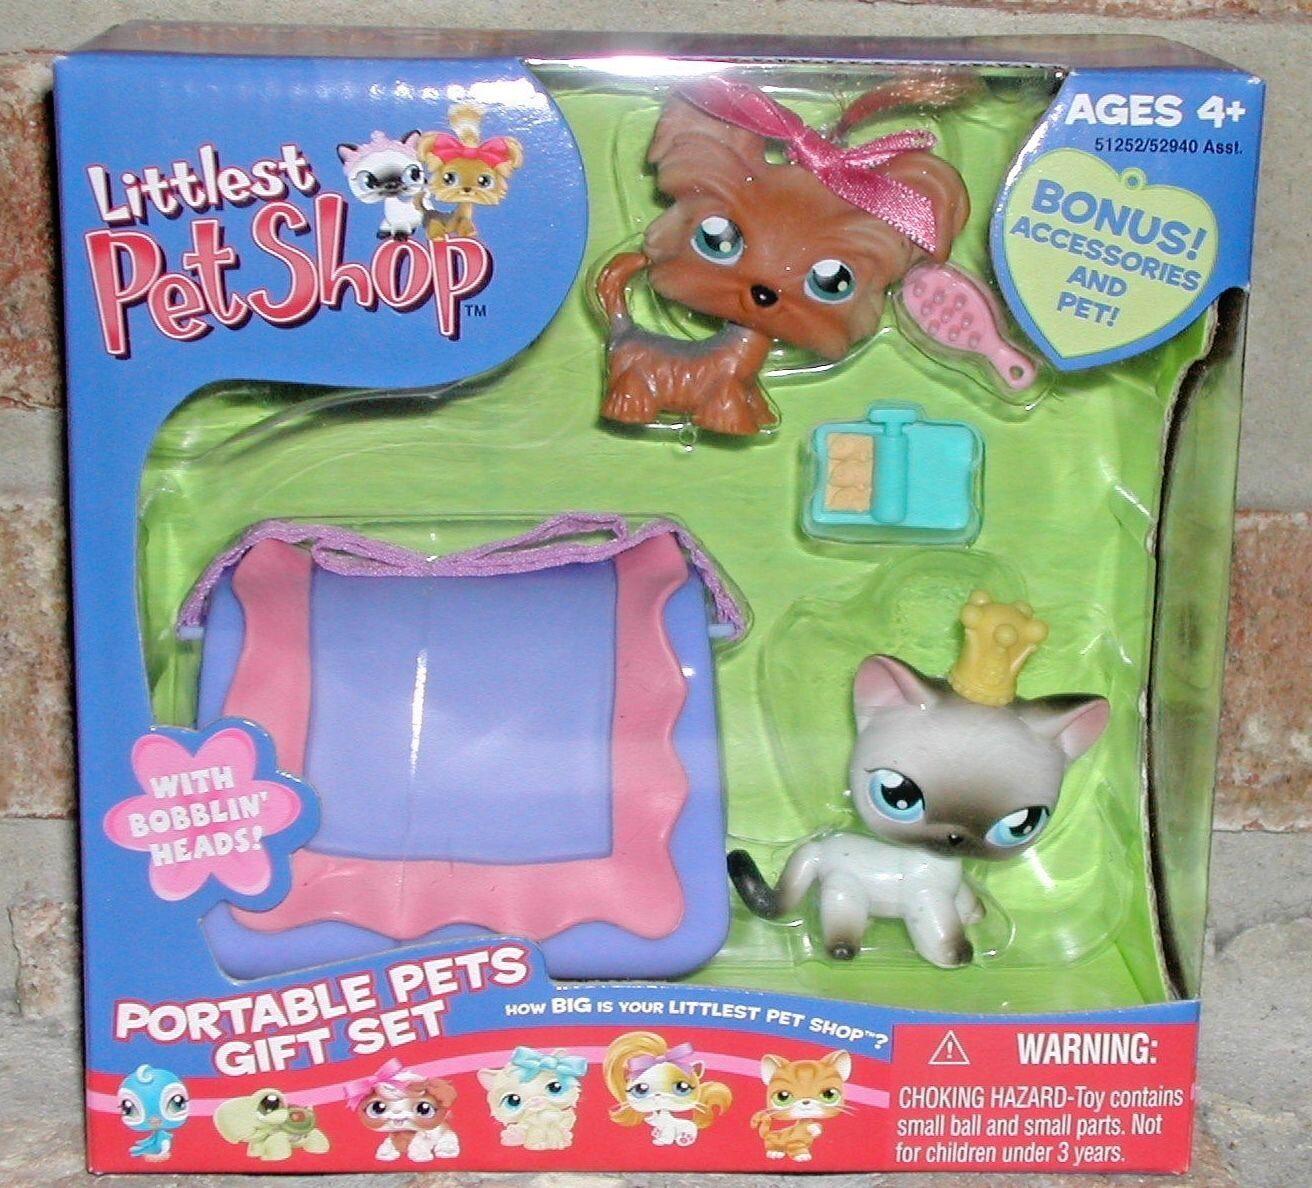 Liten Pet Shop YORKIE 6 SIAMESSE CAT 5 Portables GIFT SET -bärare VHTF 2005